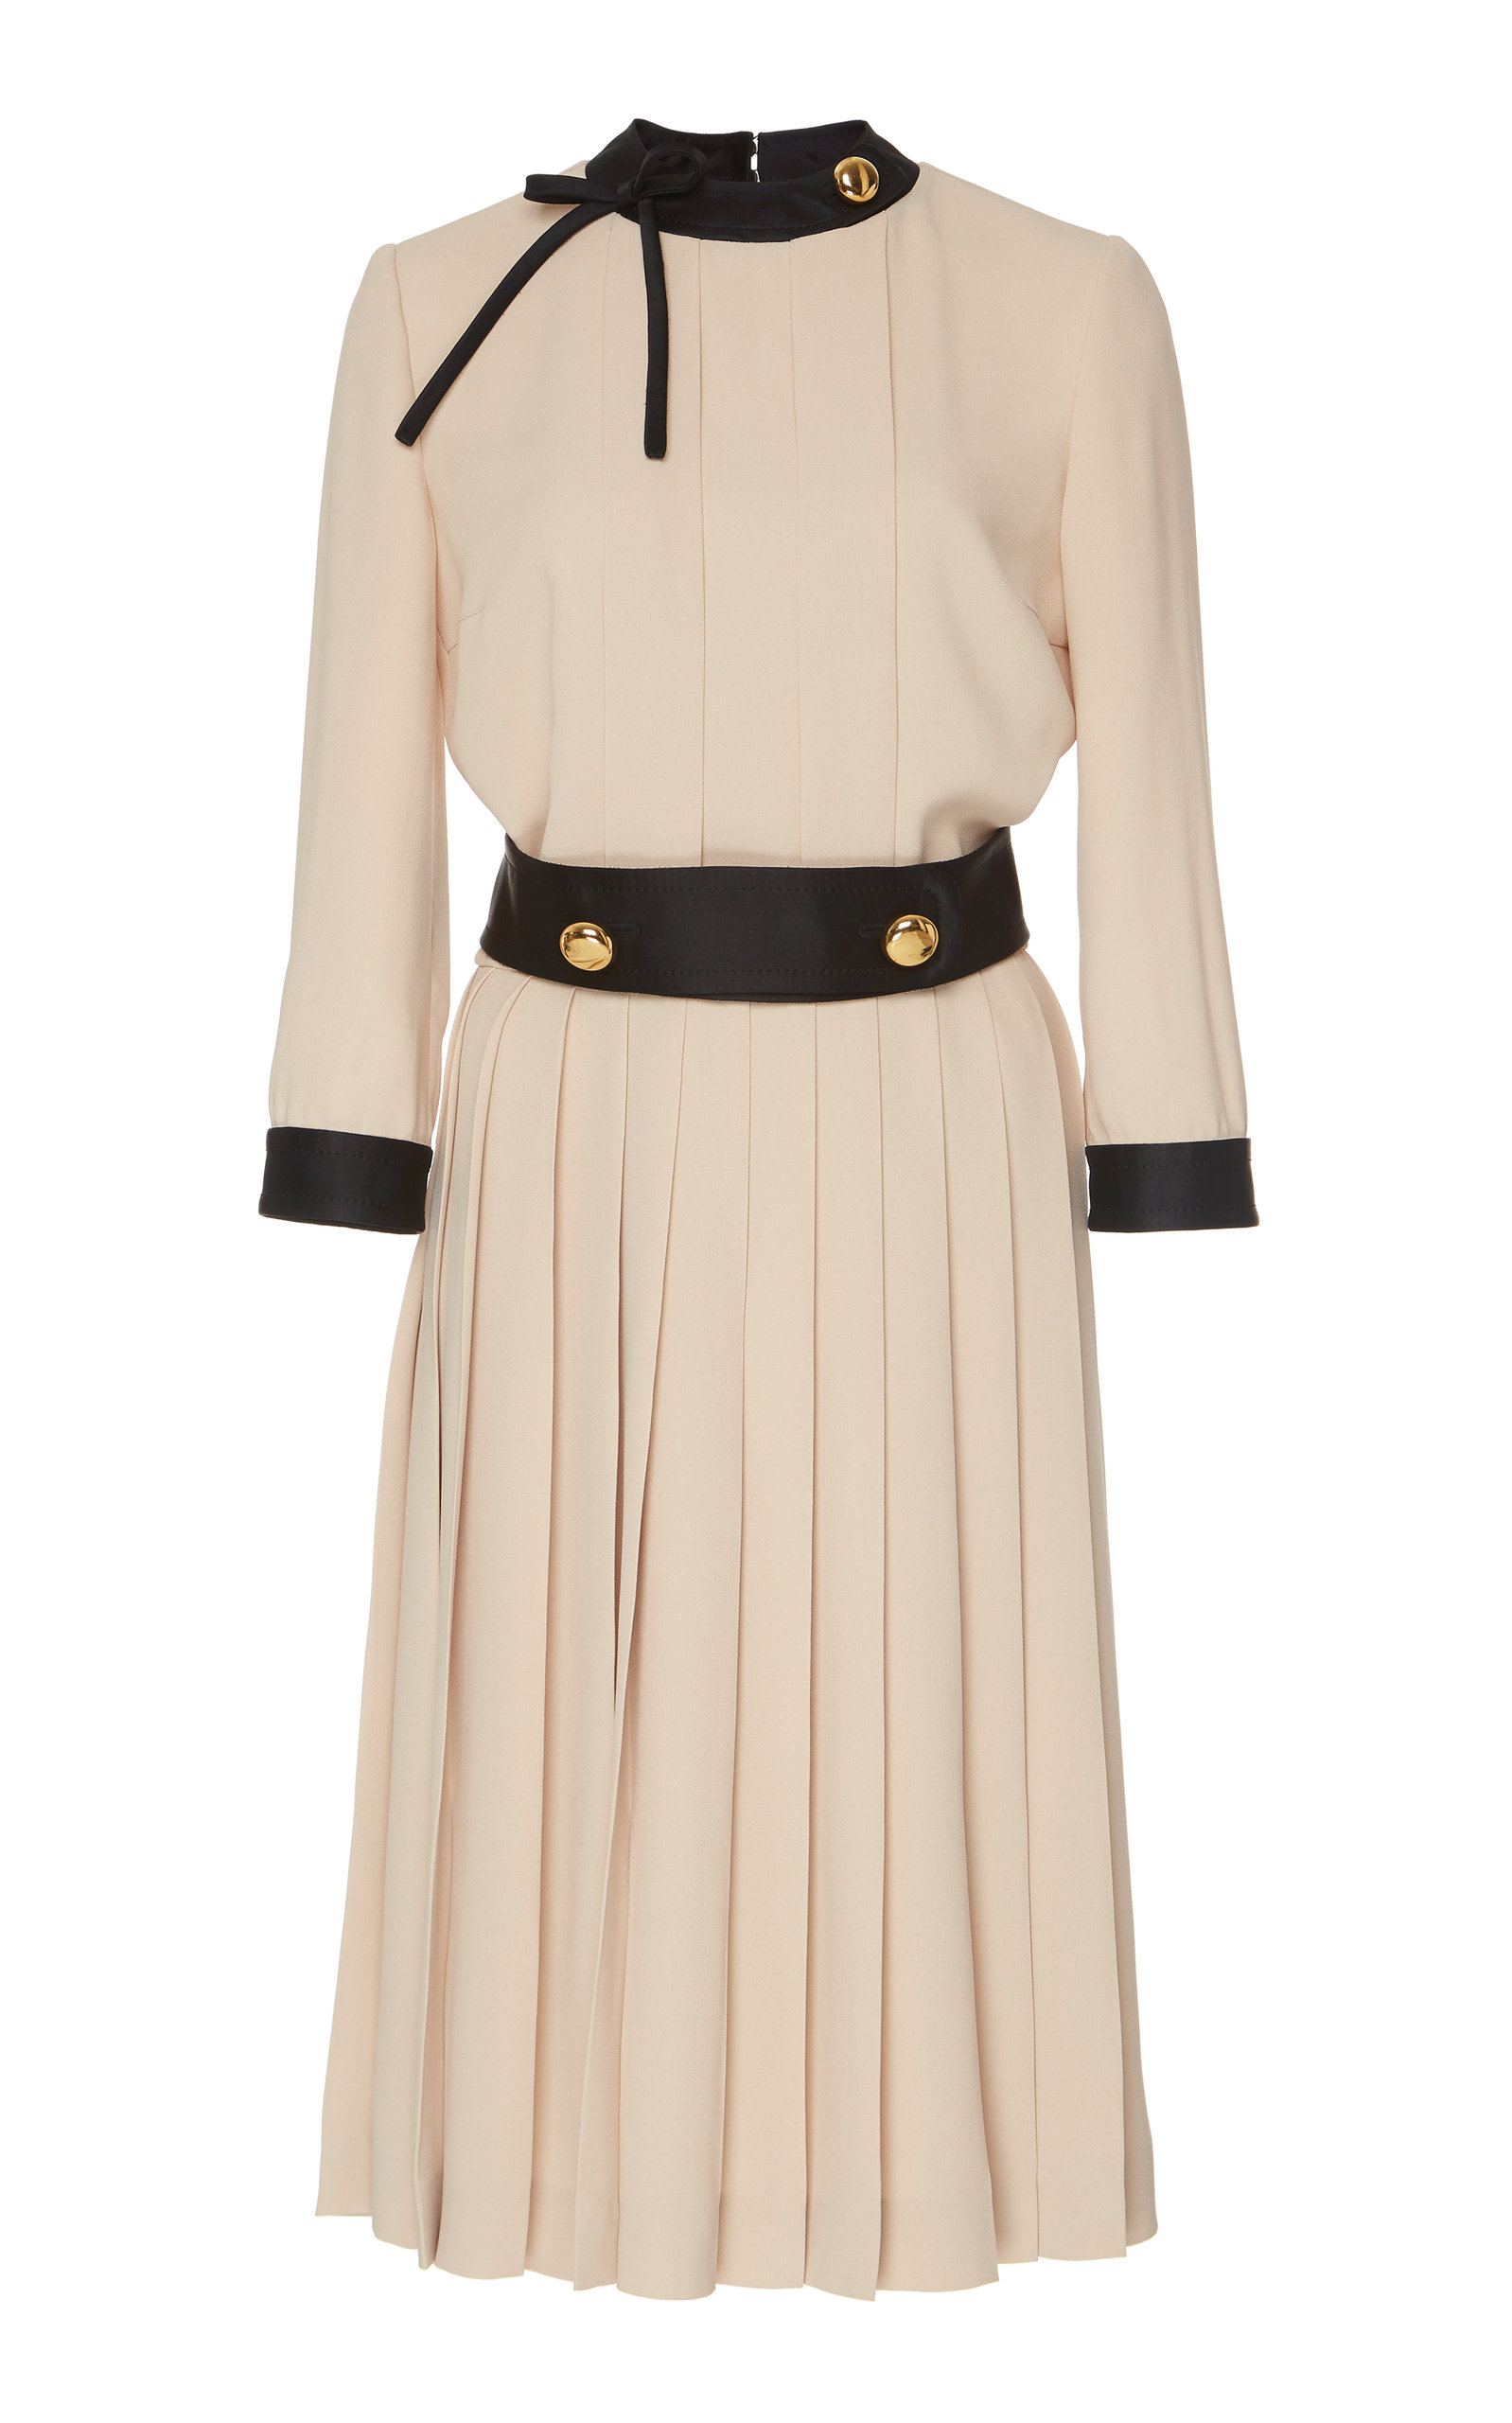 Buy Prada Button-Detailed Pleated Crepe Midi Dress online, shop Prada at the best price